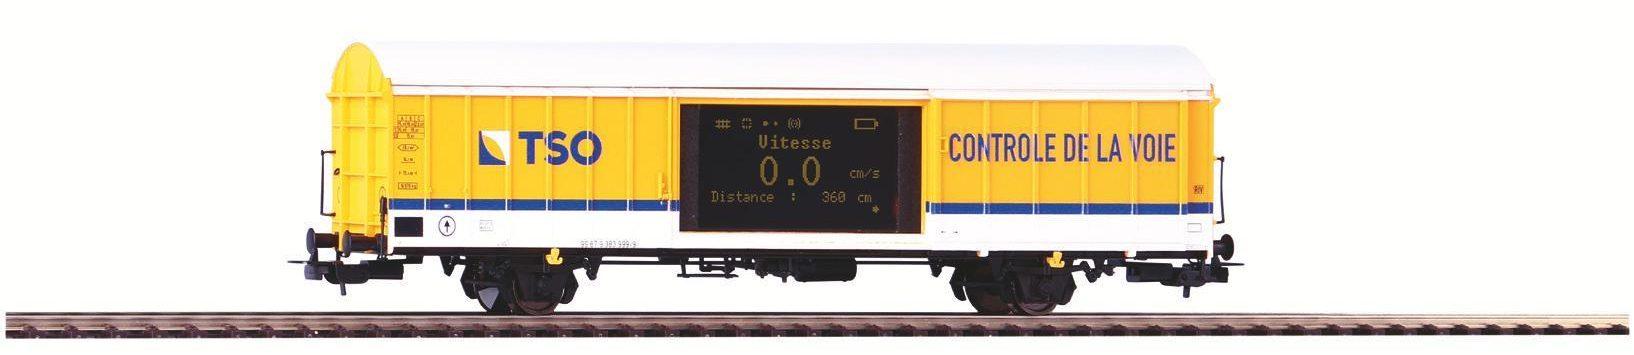 Wagon de mesure de vitesse Piko livrée TSO réf. 55053